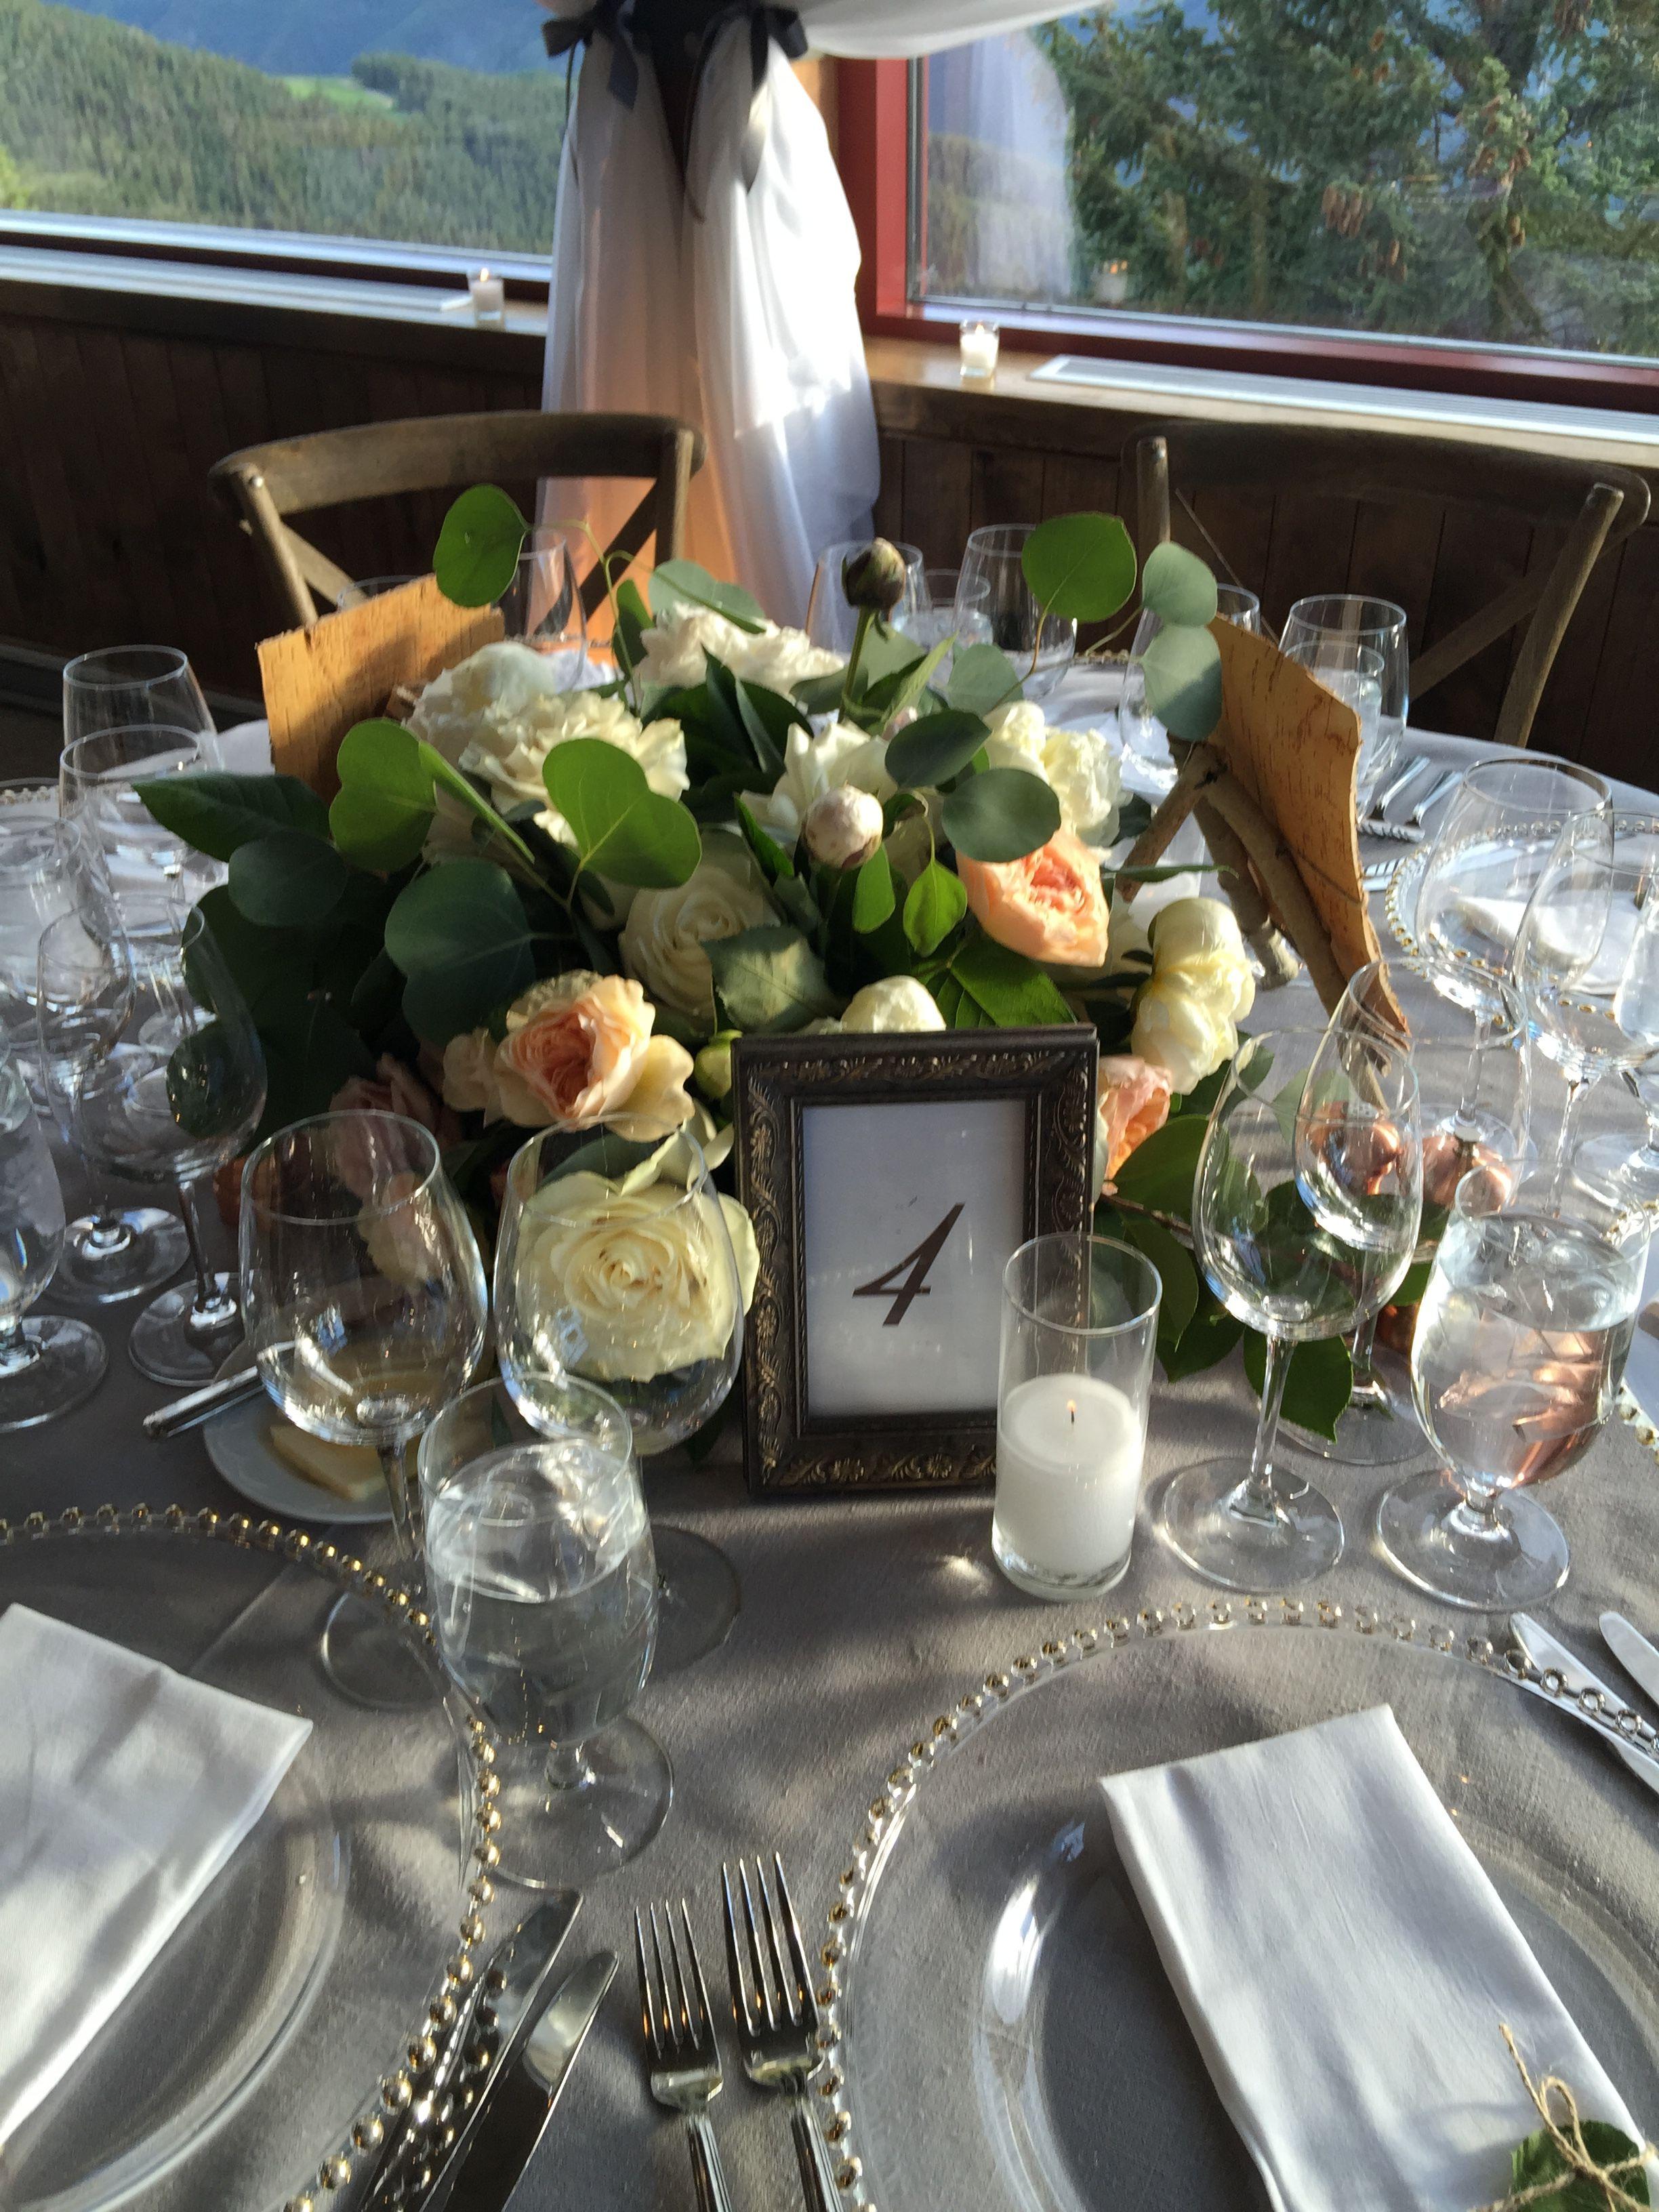 A peachy keen centerpiece for a romantic wedding! #aspenmountain #aspenwedding #mountainwedding